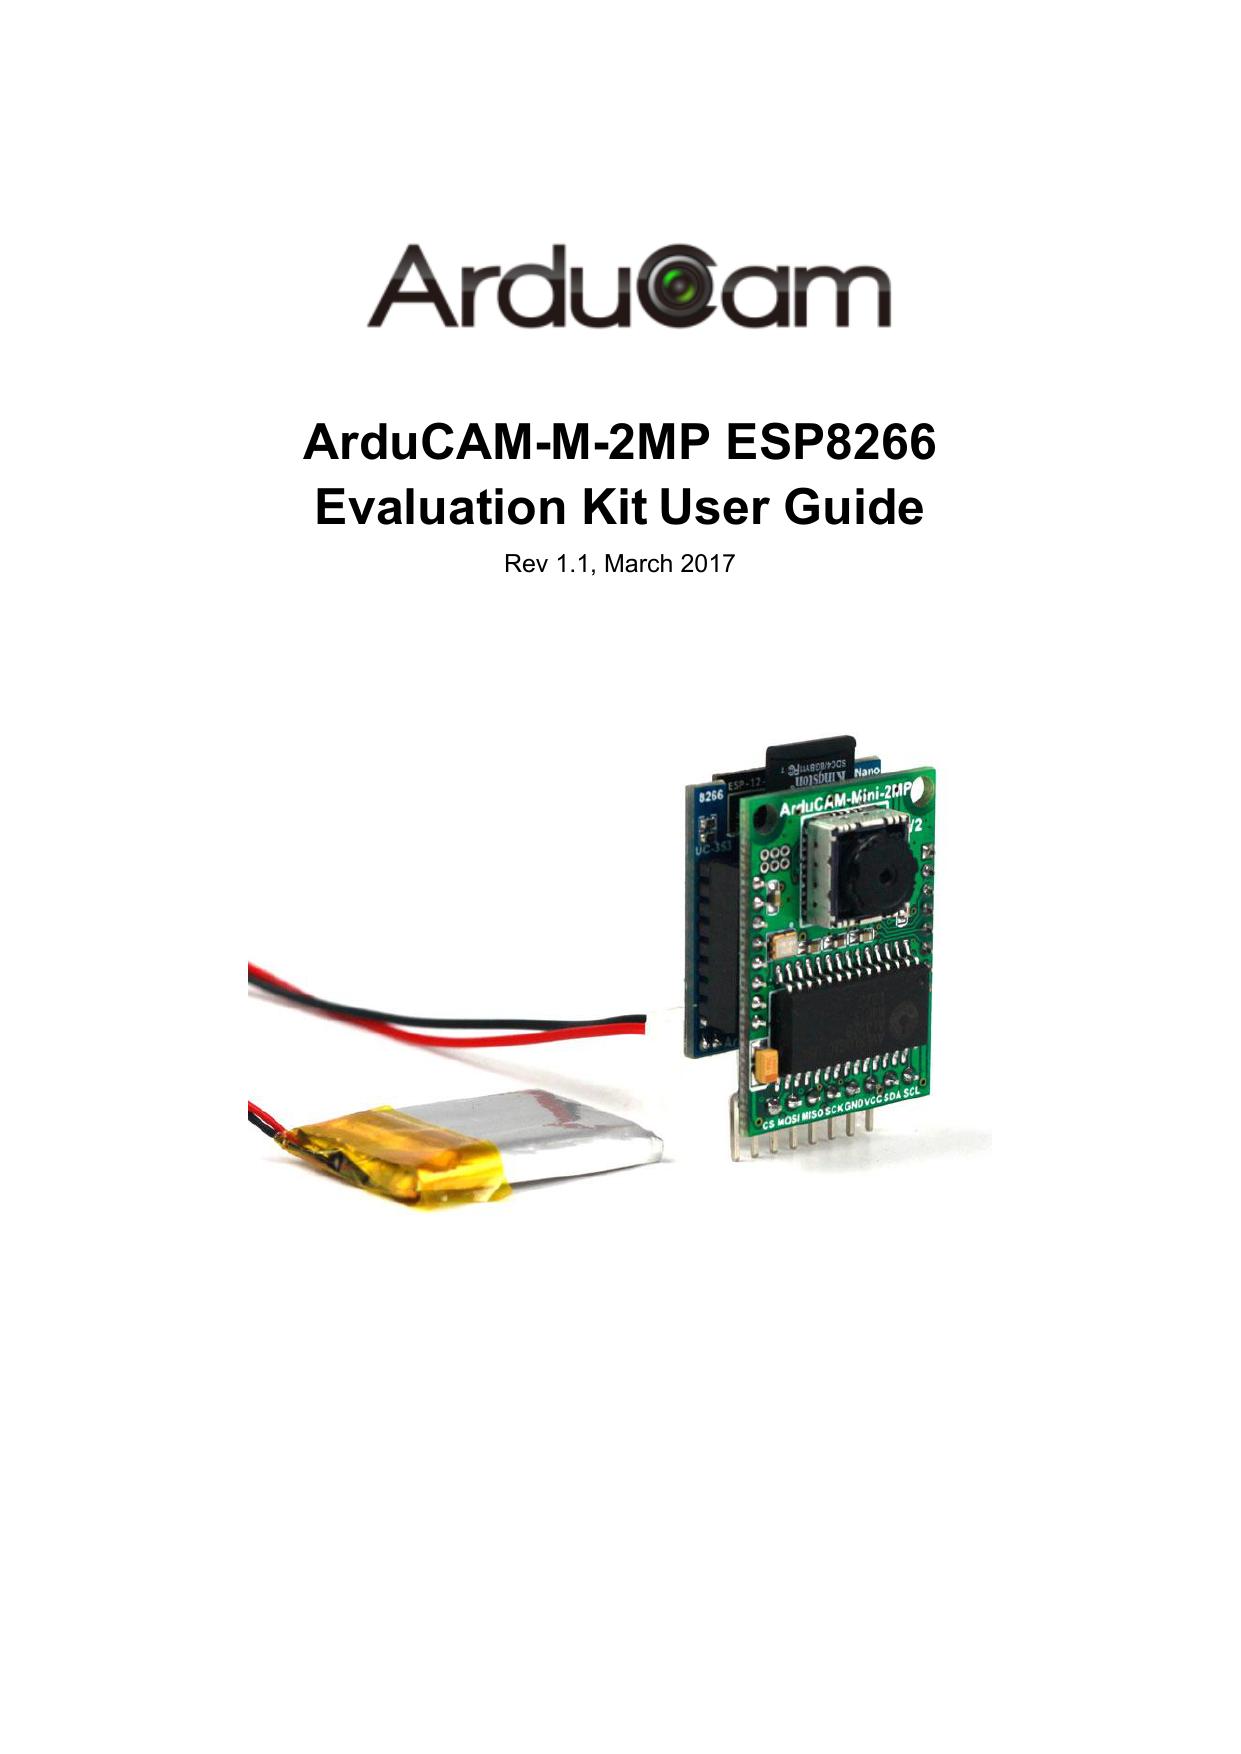 ArduCAM-M-2MP ESP8266 Evaluation Kit User Guide | manualzz com